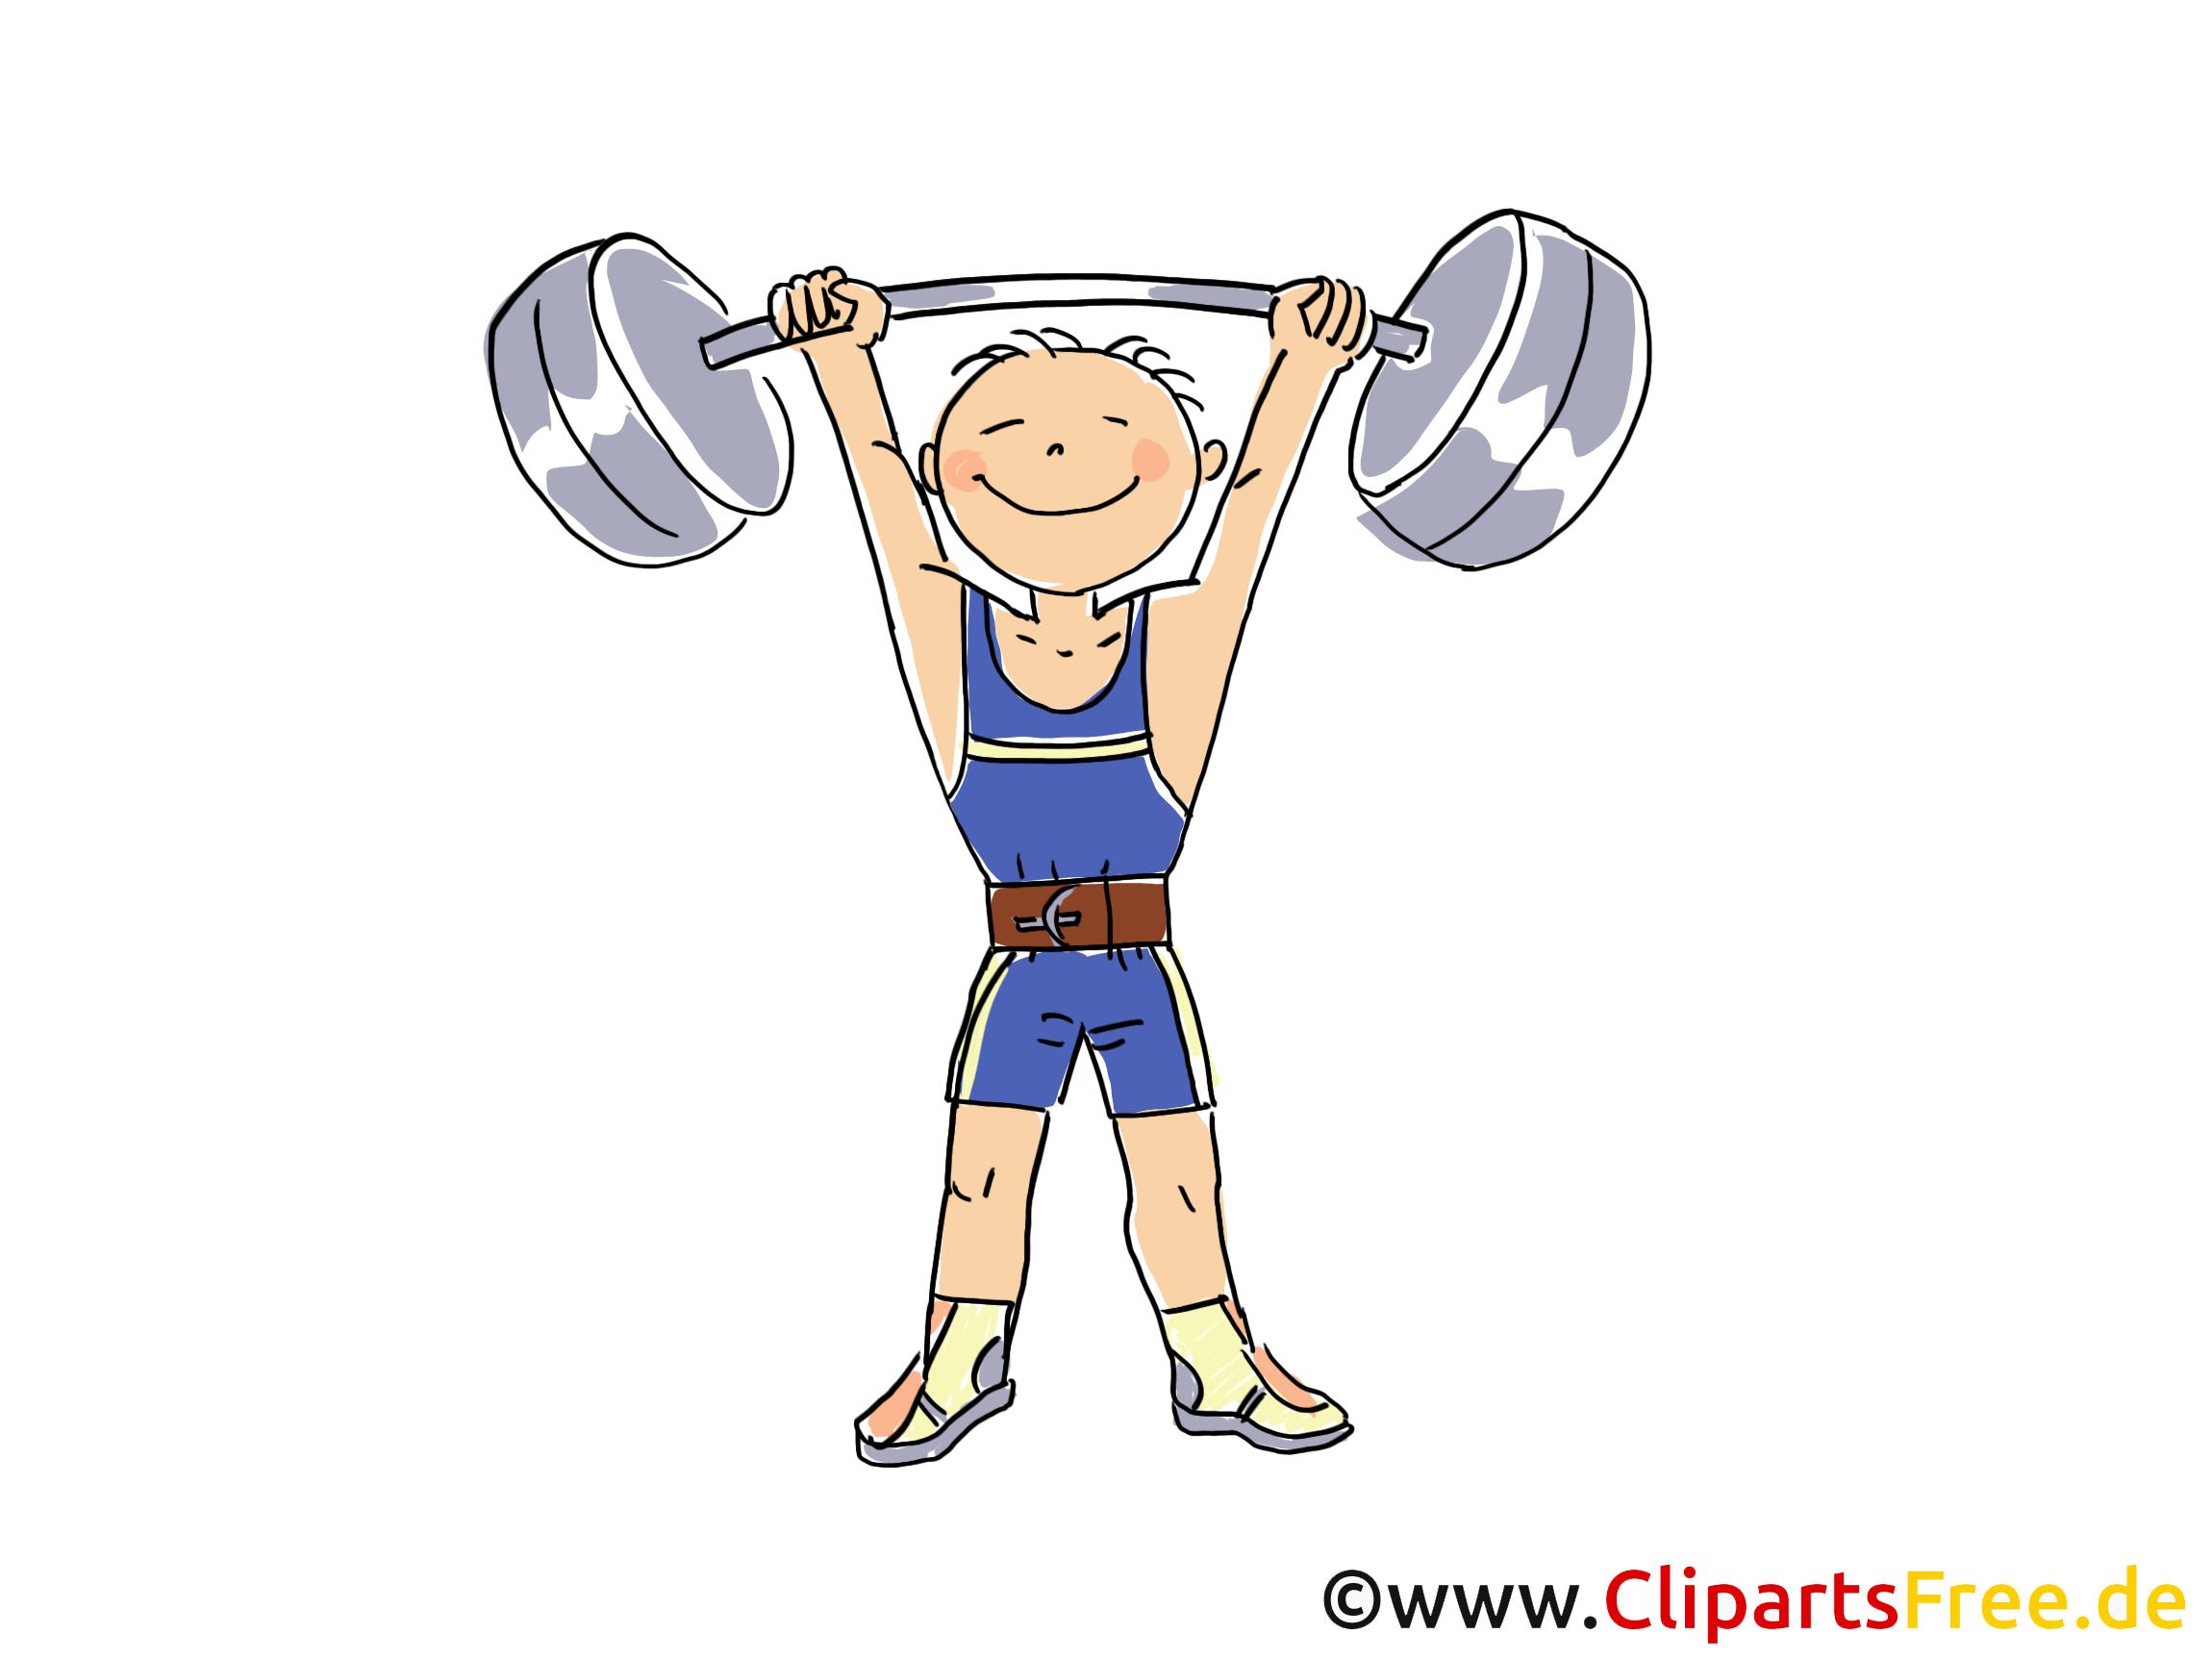 gewichtheben bild  sport cliparts  comic  cartoon  image gratis sport clip arts sport clip art free printable